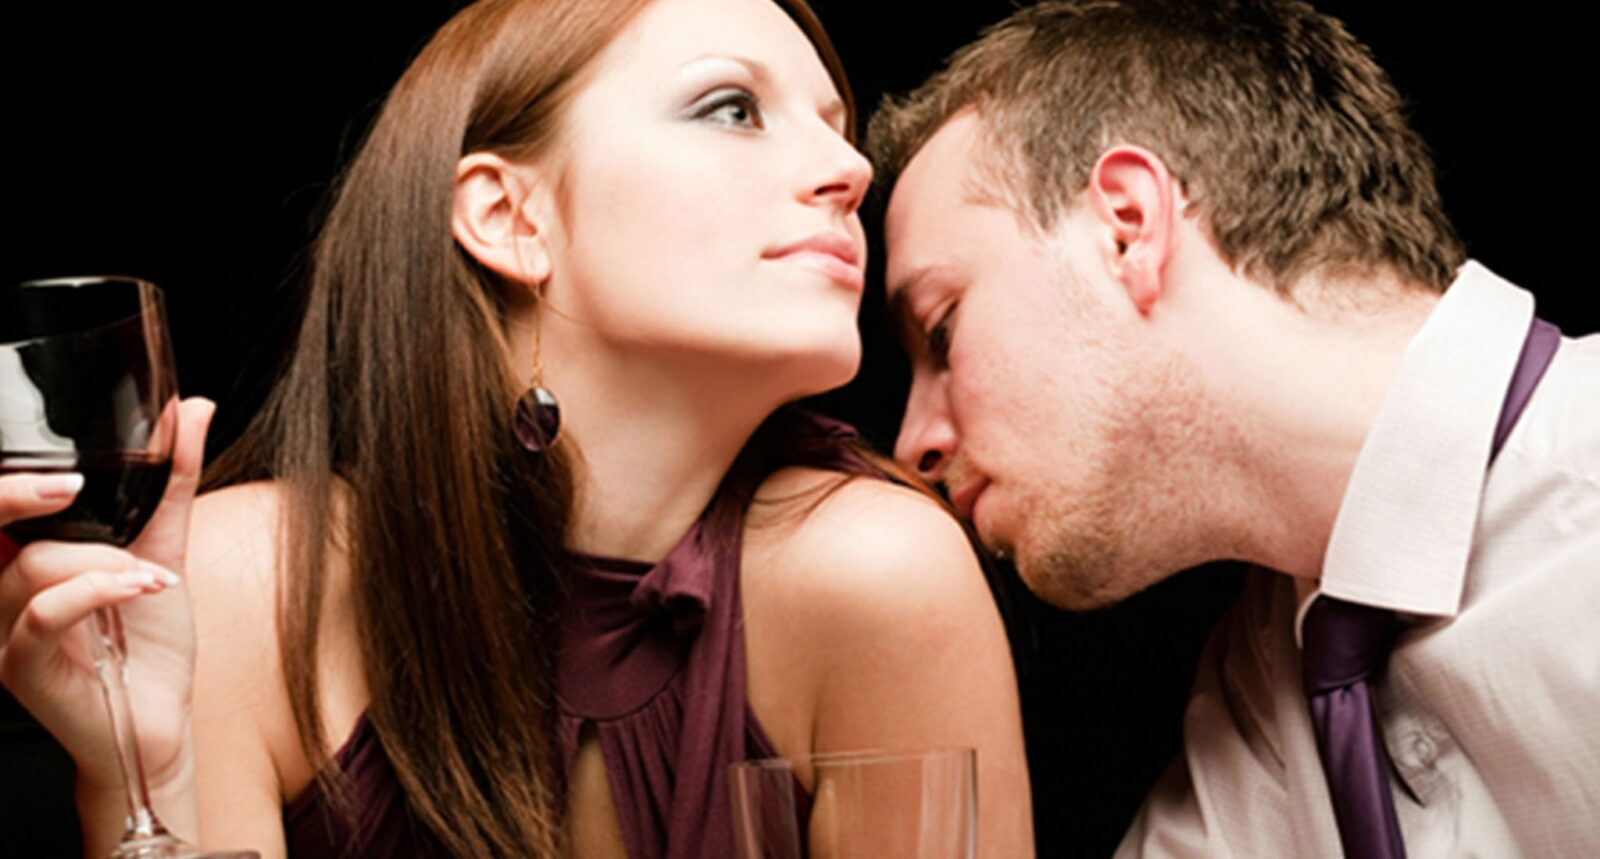 Как нравиться мужчинам Psychology and the city 59